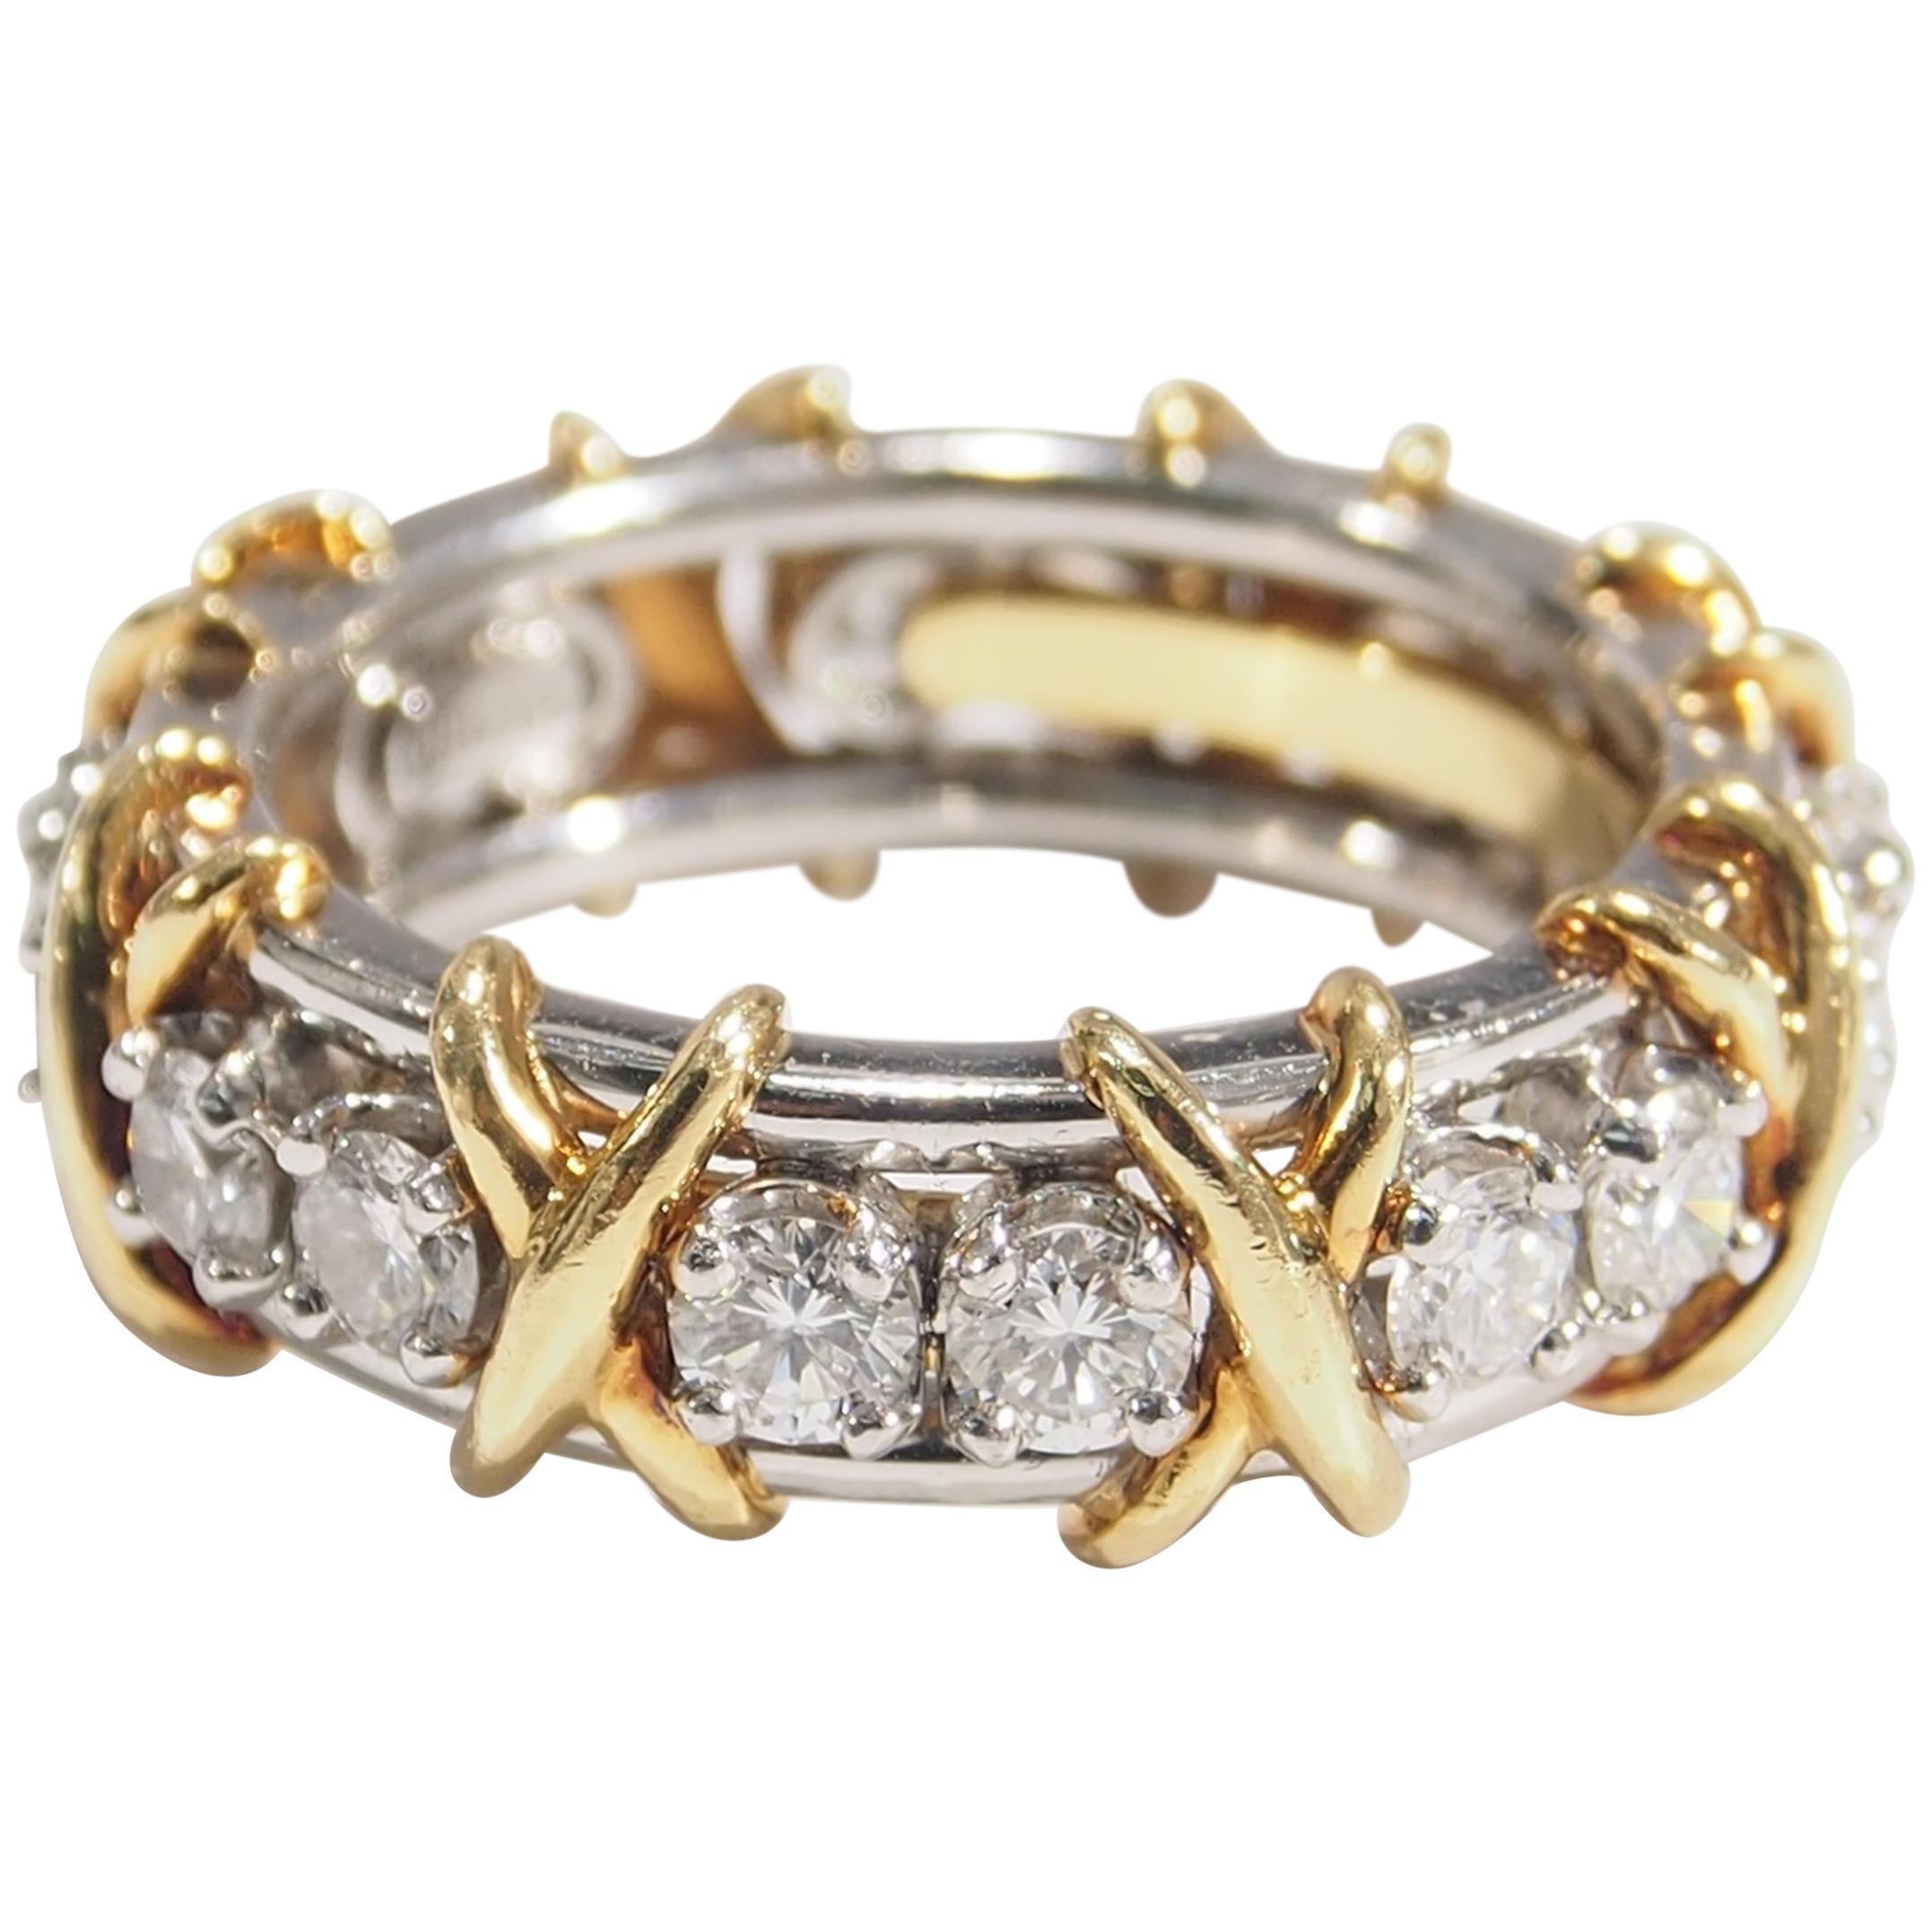 18 Karat Tiffany and Co Schlumberger Diamond Ring Platinum Yellow Gold